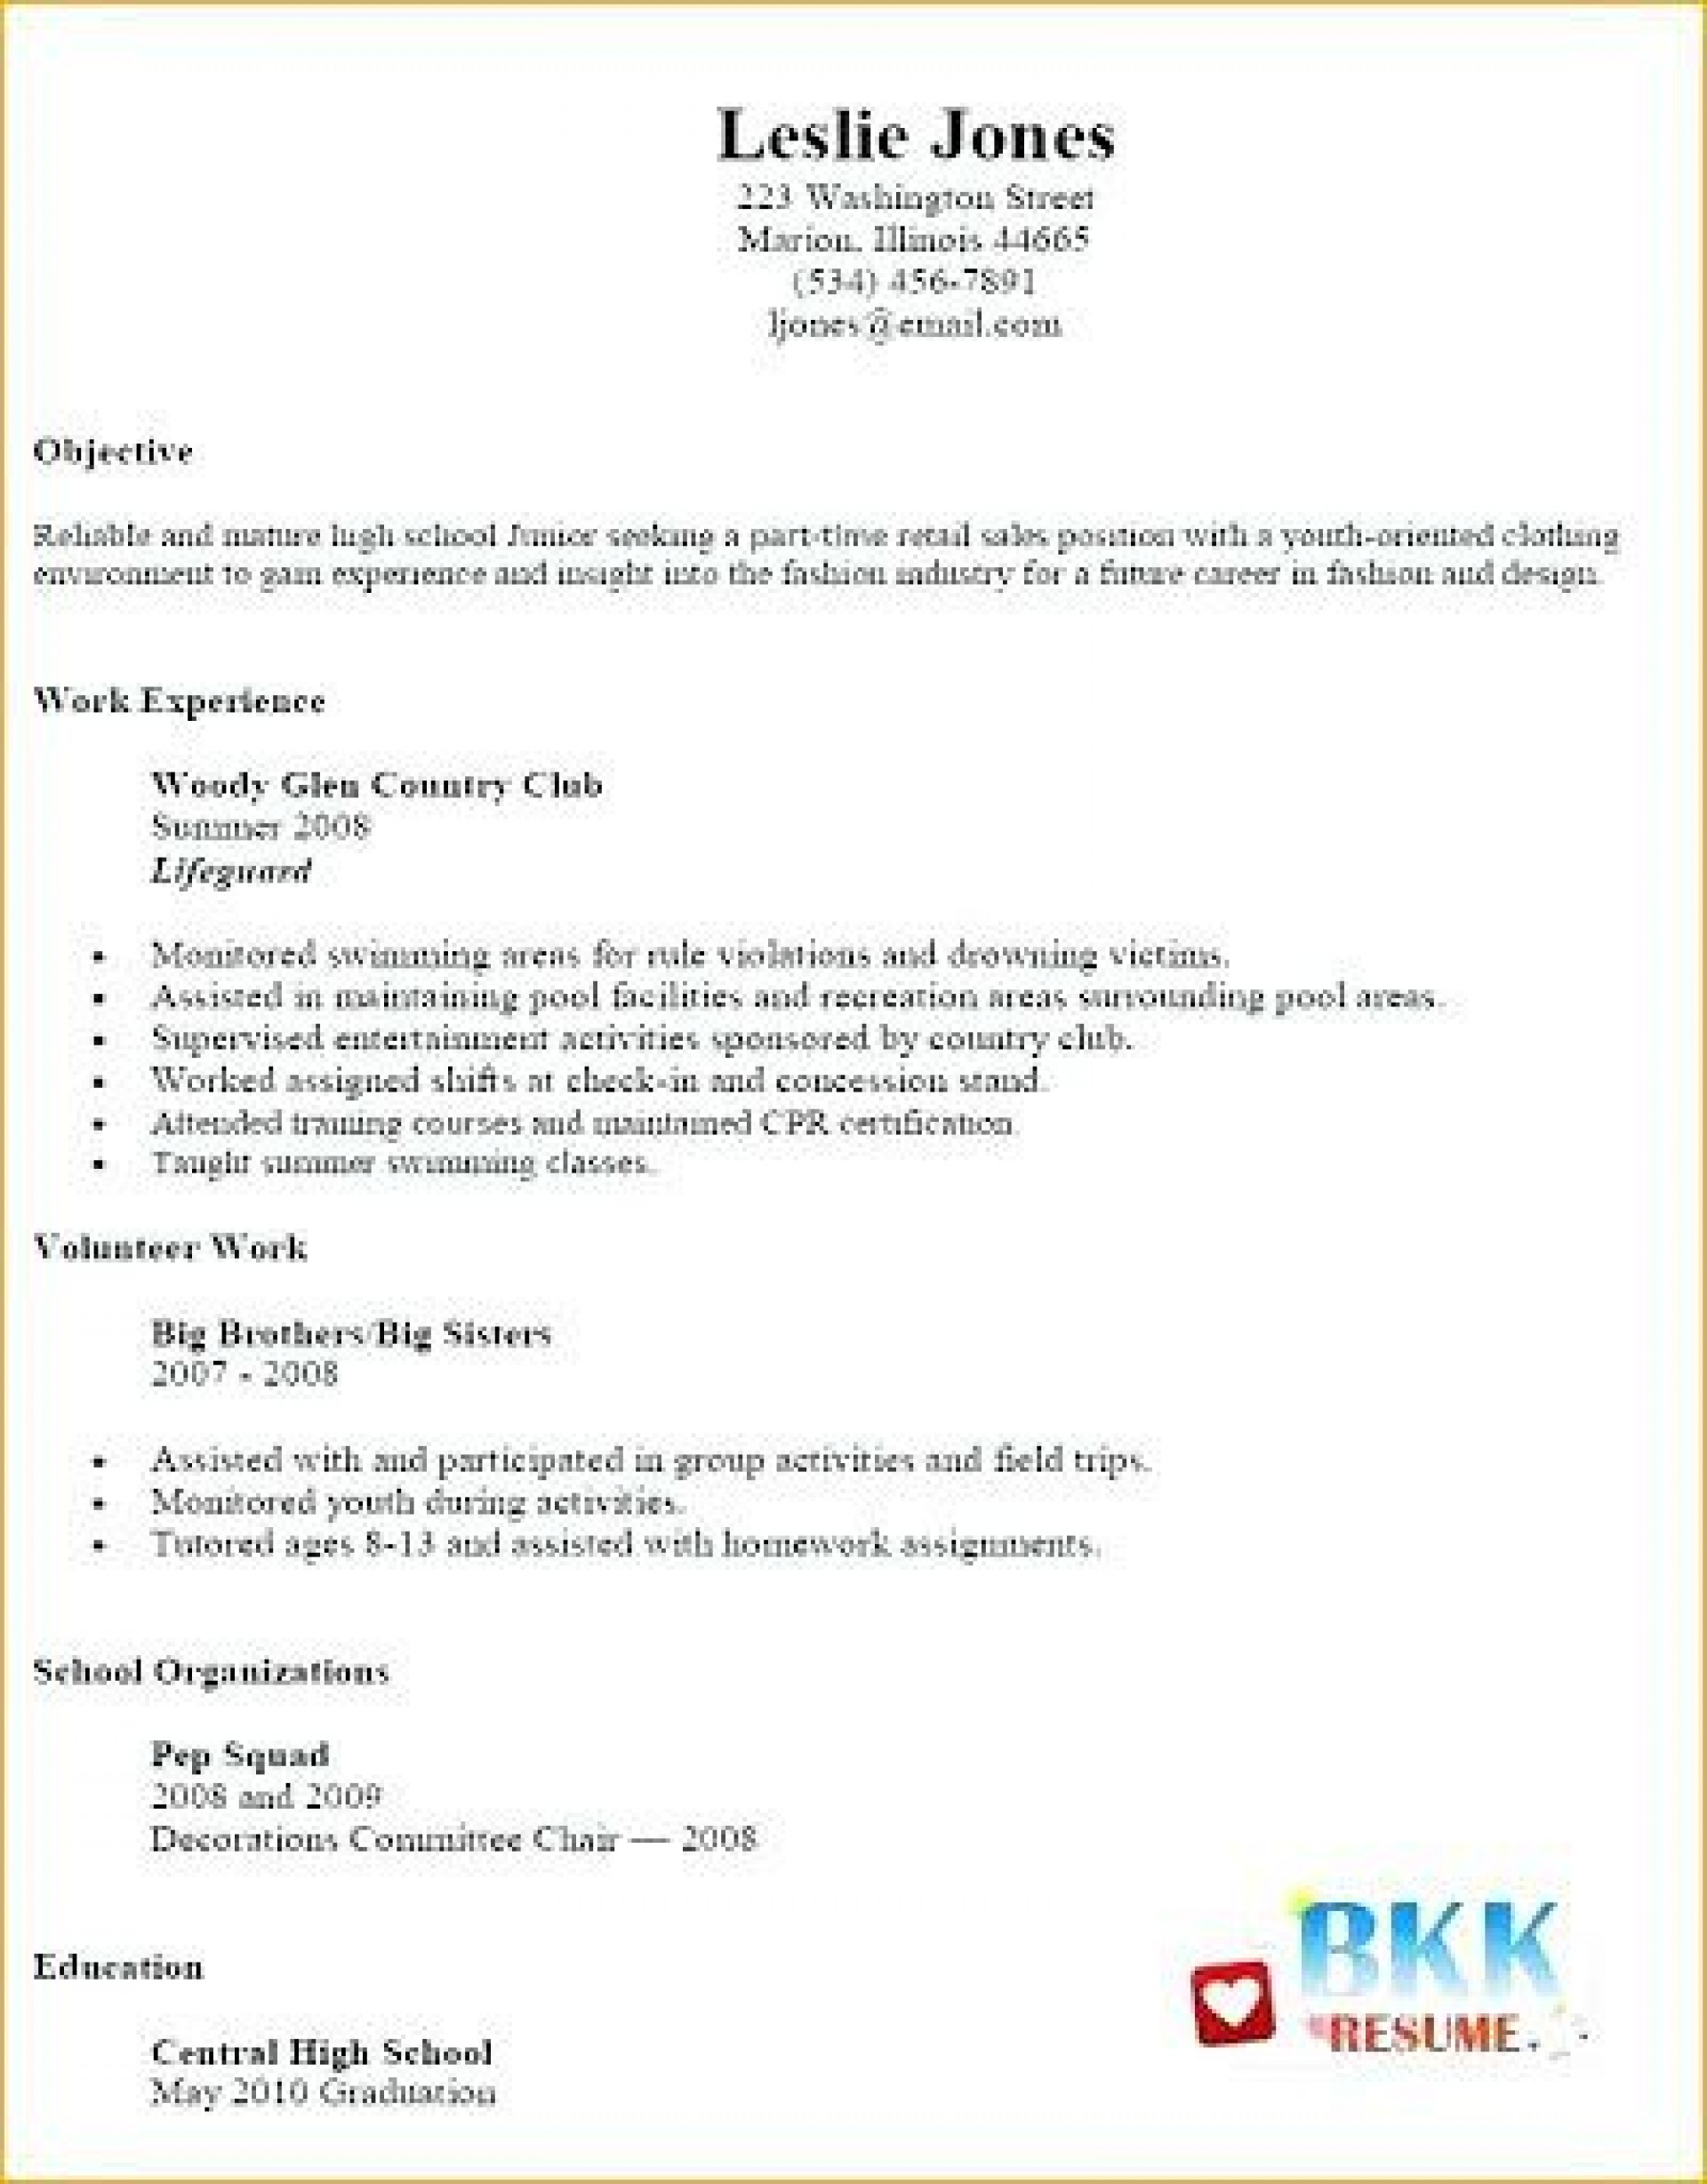 002 Unbelievable Resume Template For Teen High Def  Teenager First Job Australia1920